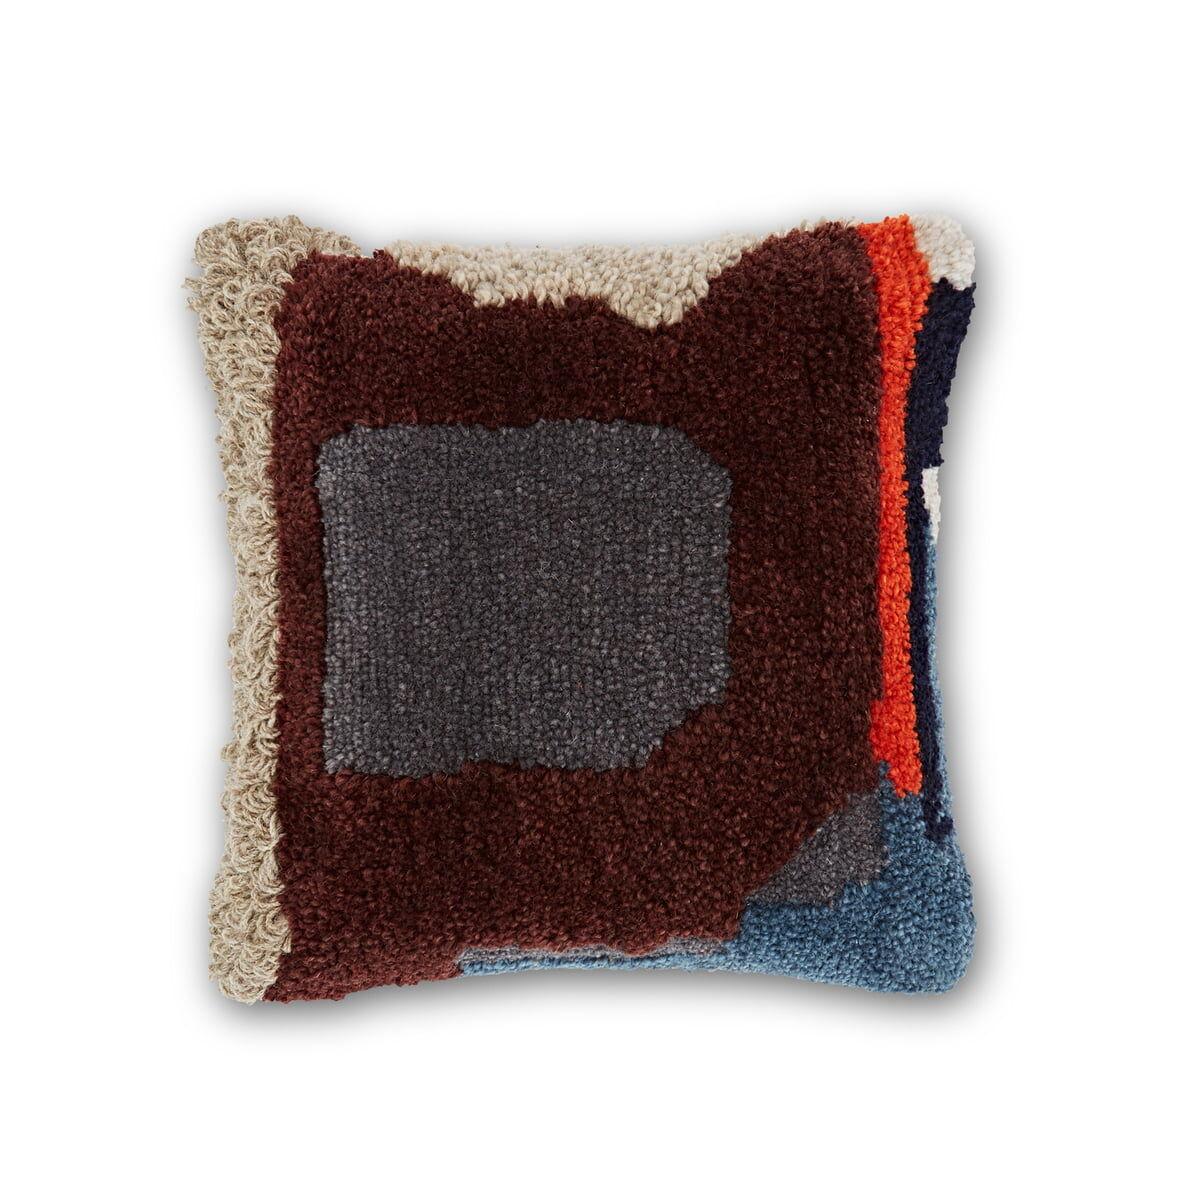 Tom Dixon - Coussin Abstract, 45 x 45 cm, wine